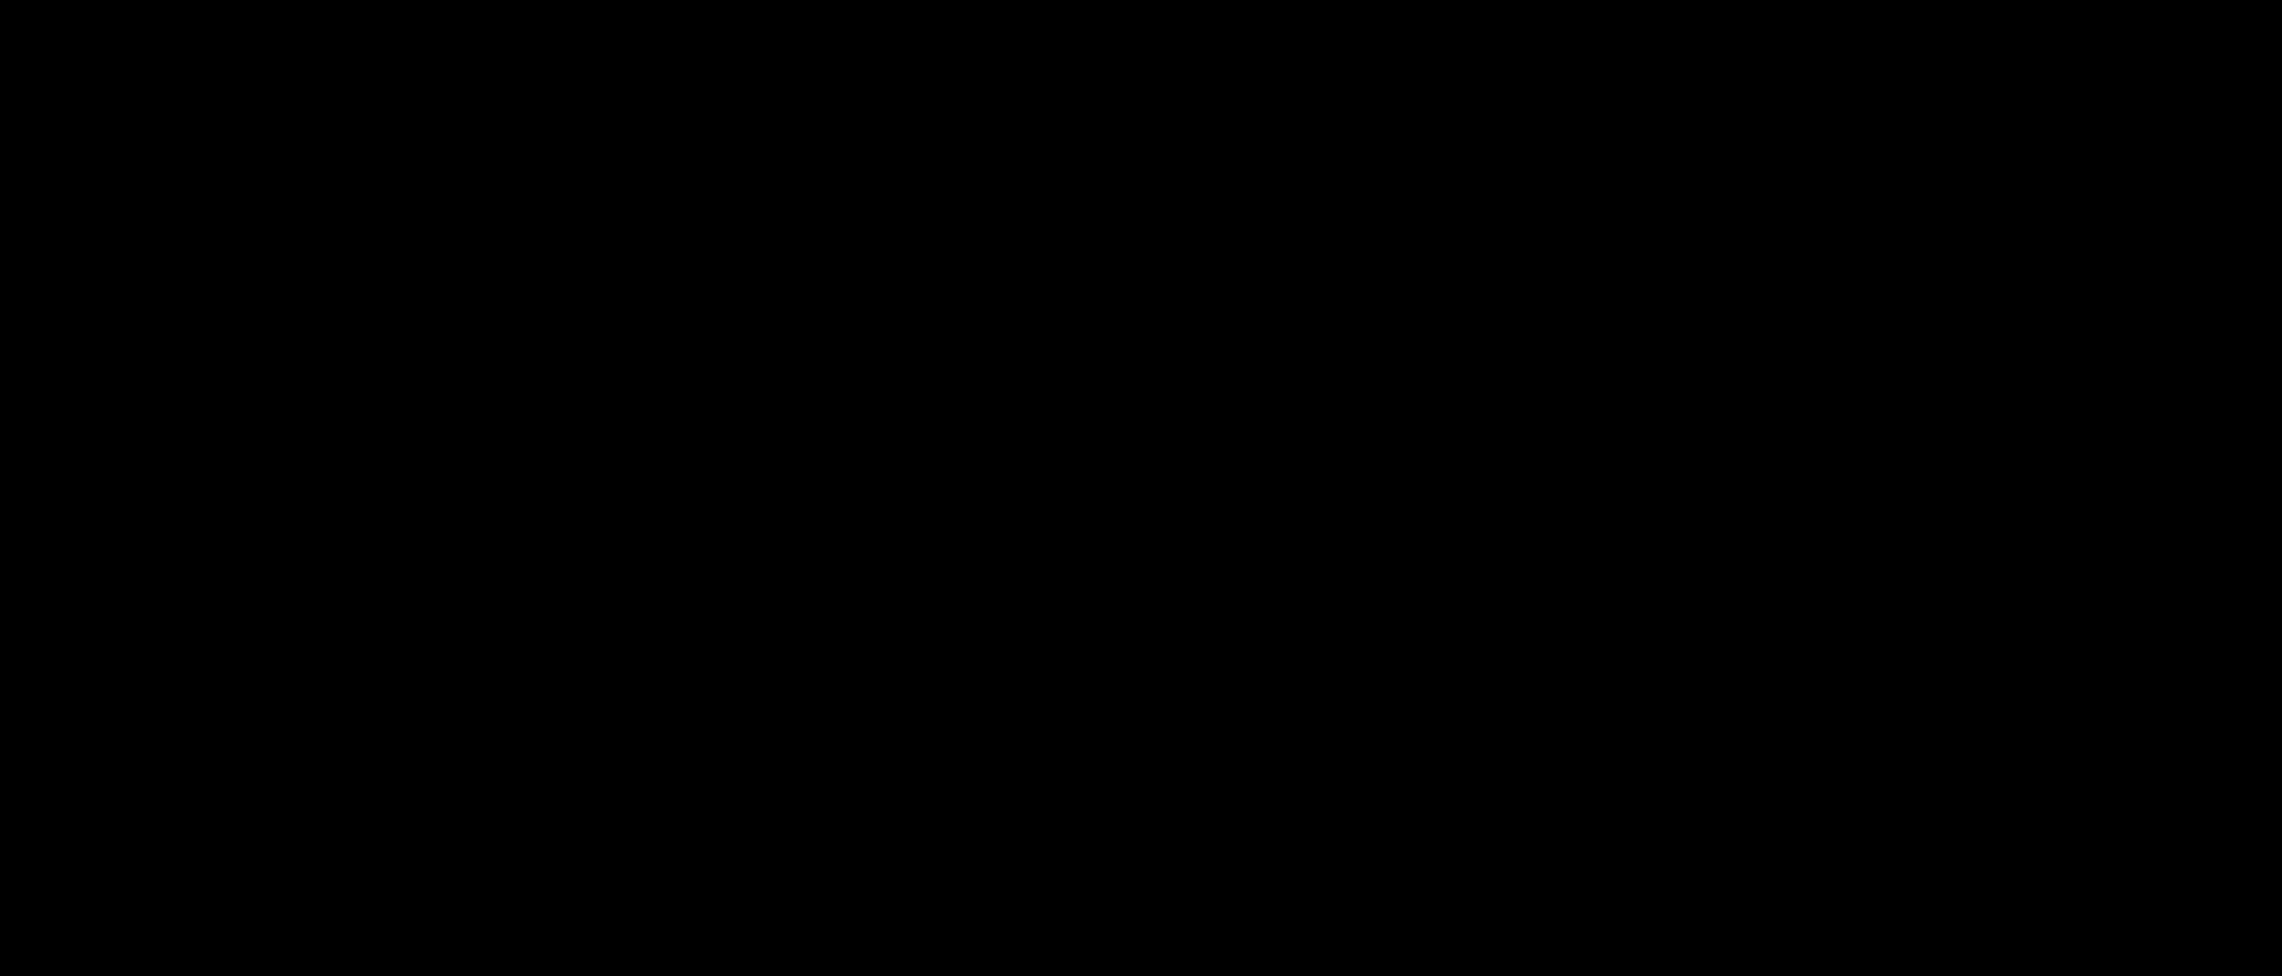 2282x976 Clipart